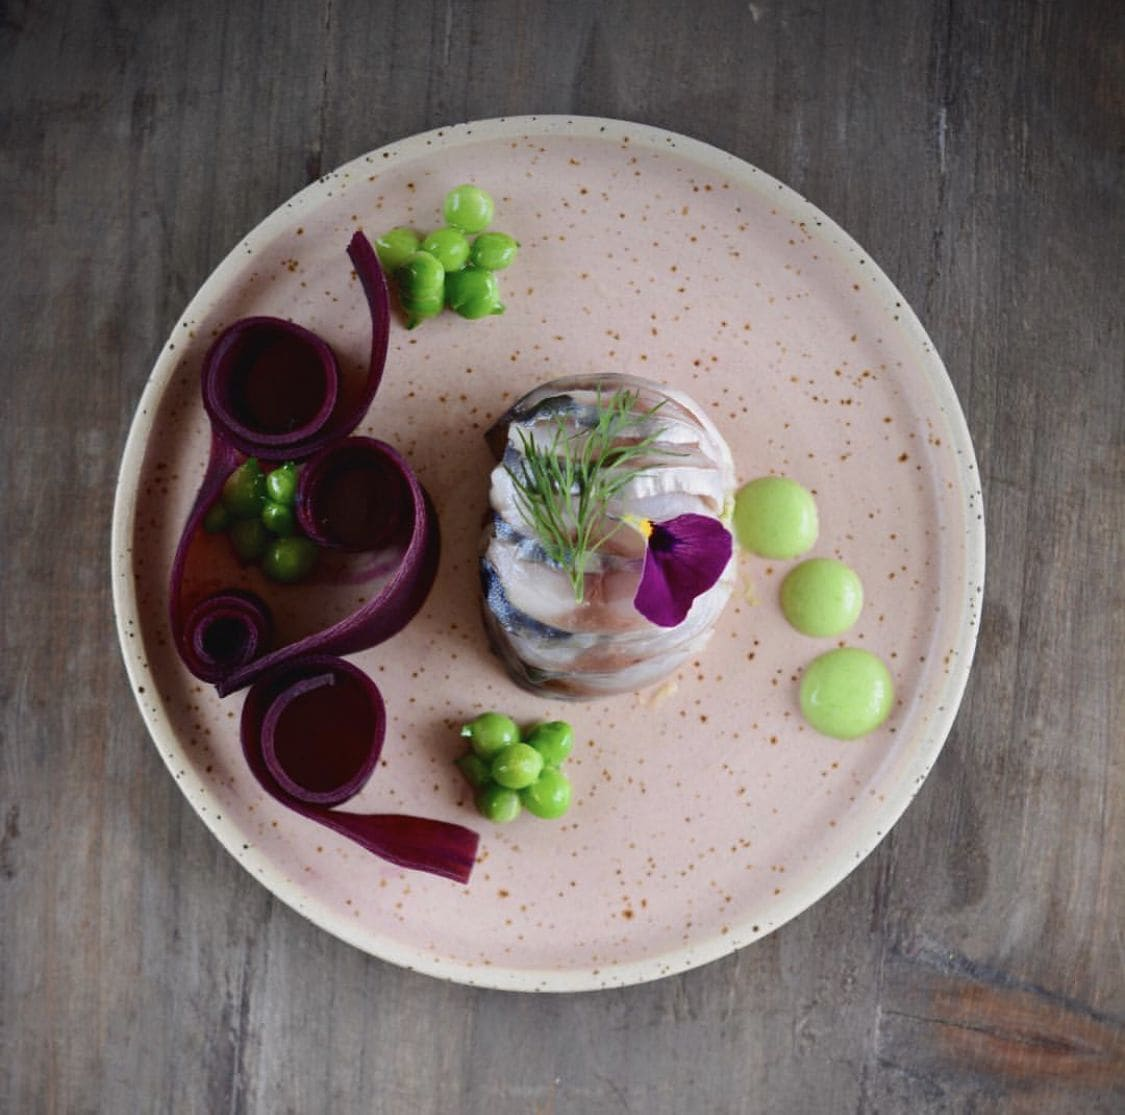 pink ceramic plate